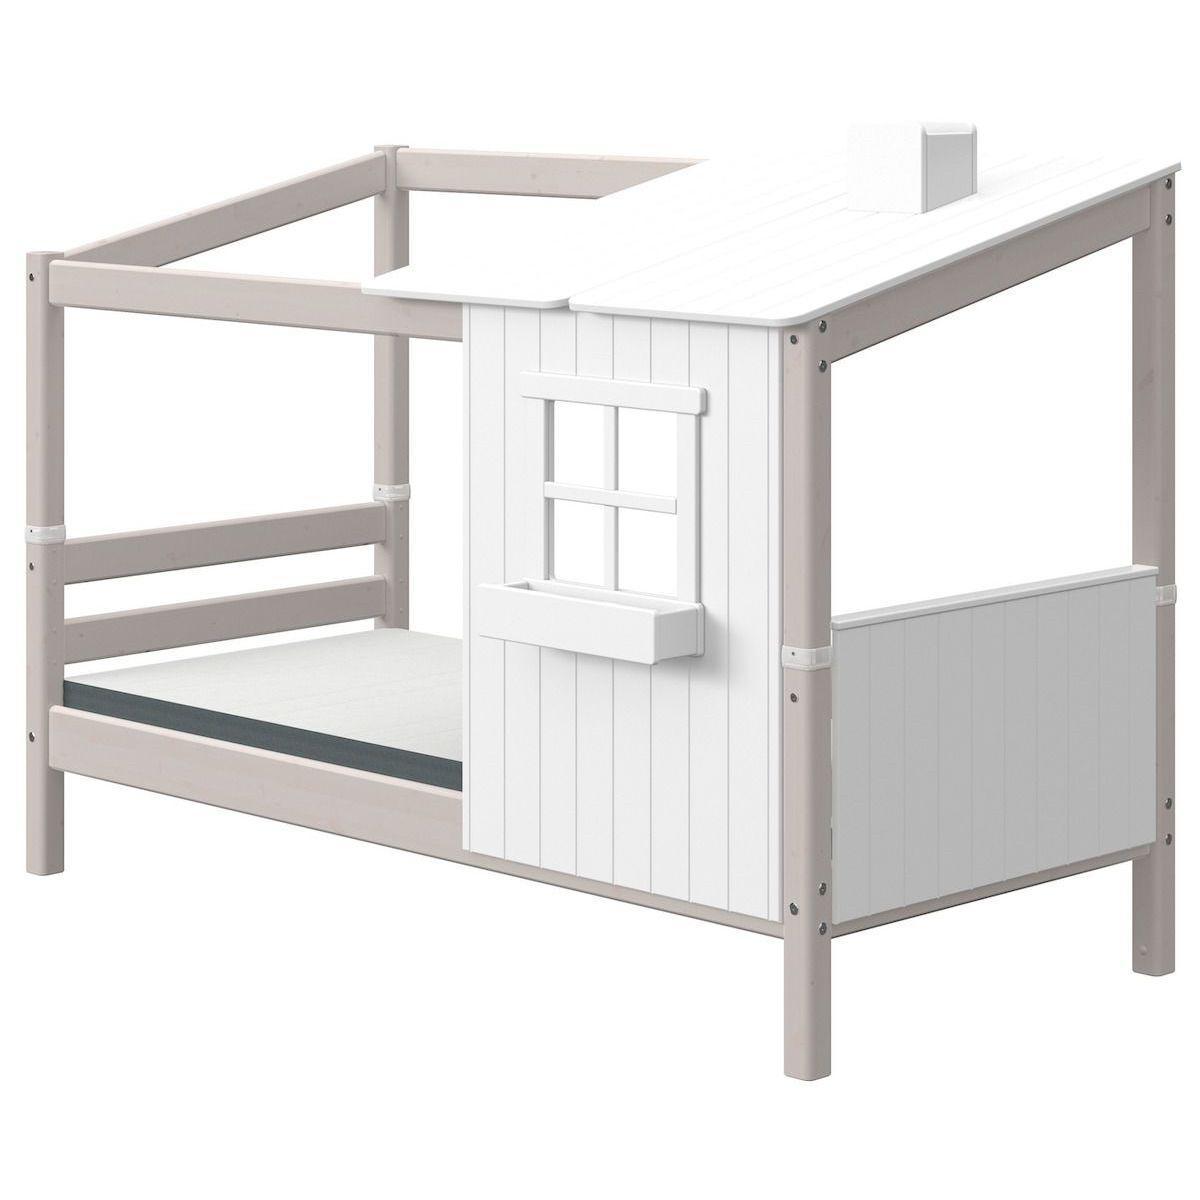 Lit bas évolutif cabane 90x190cm 1-2 PLAY HOUSE CLASSIC Flexa blanc-grey washed